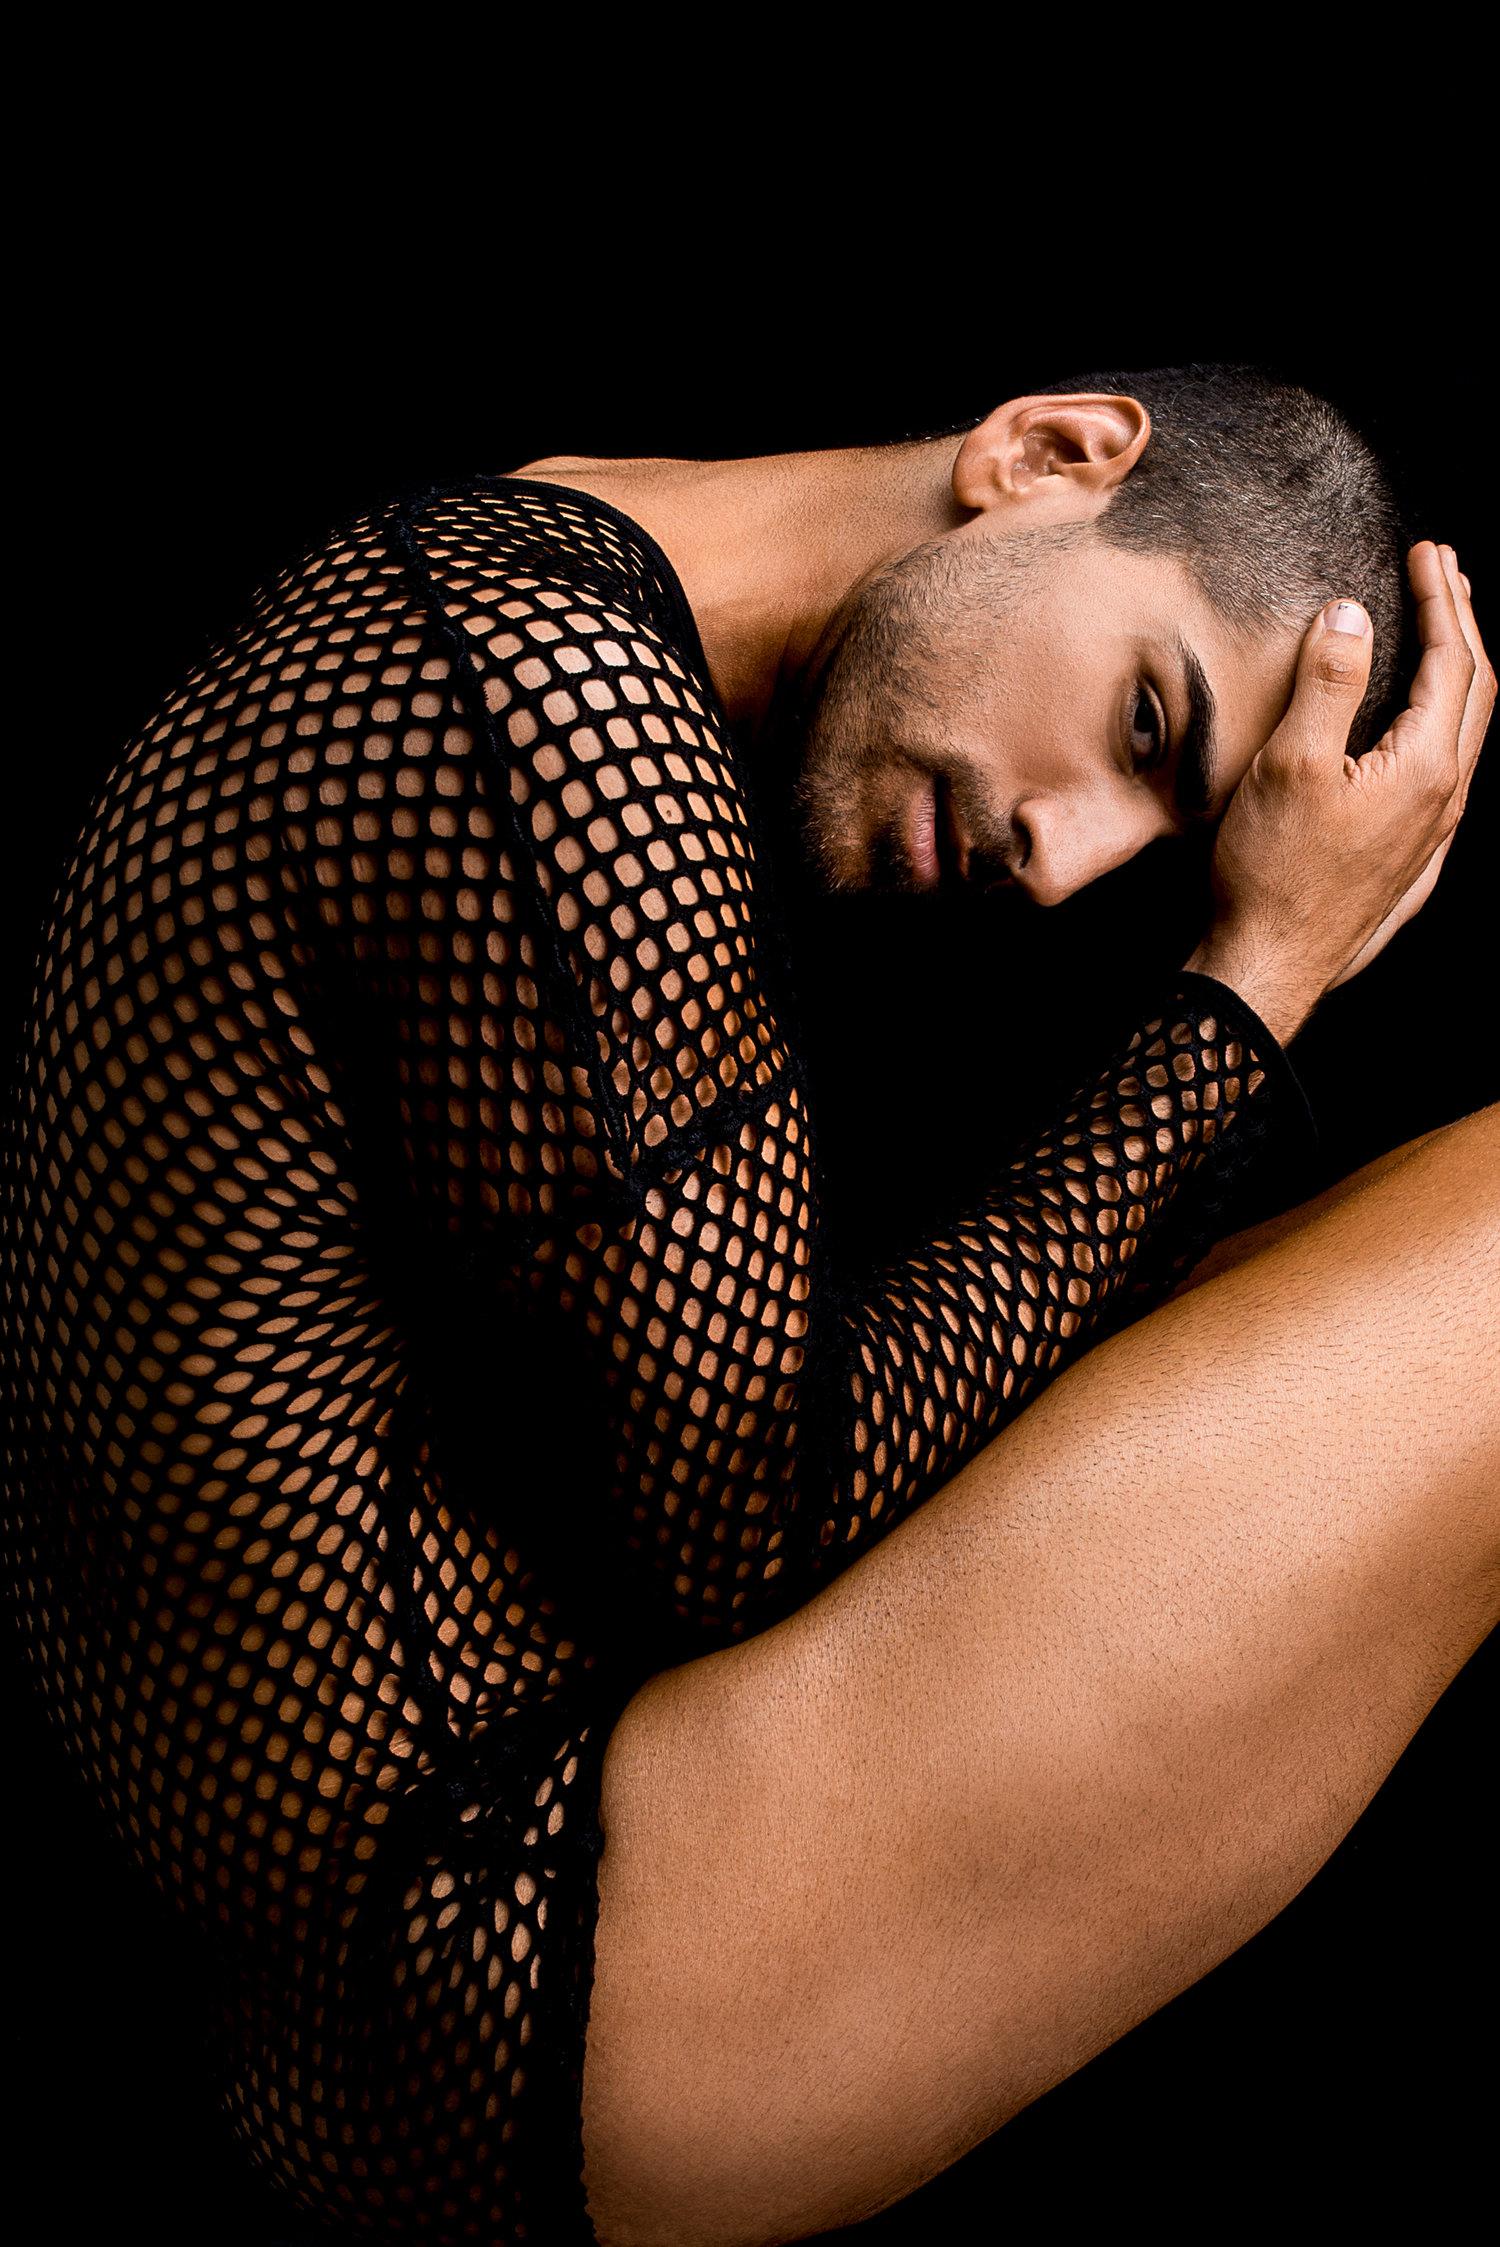 Adon Exclusive: Model Andres Leonardi By Fritz Yap